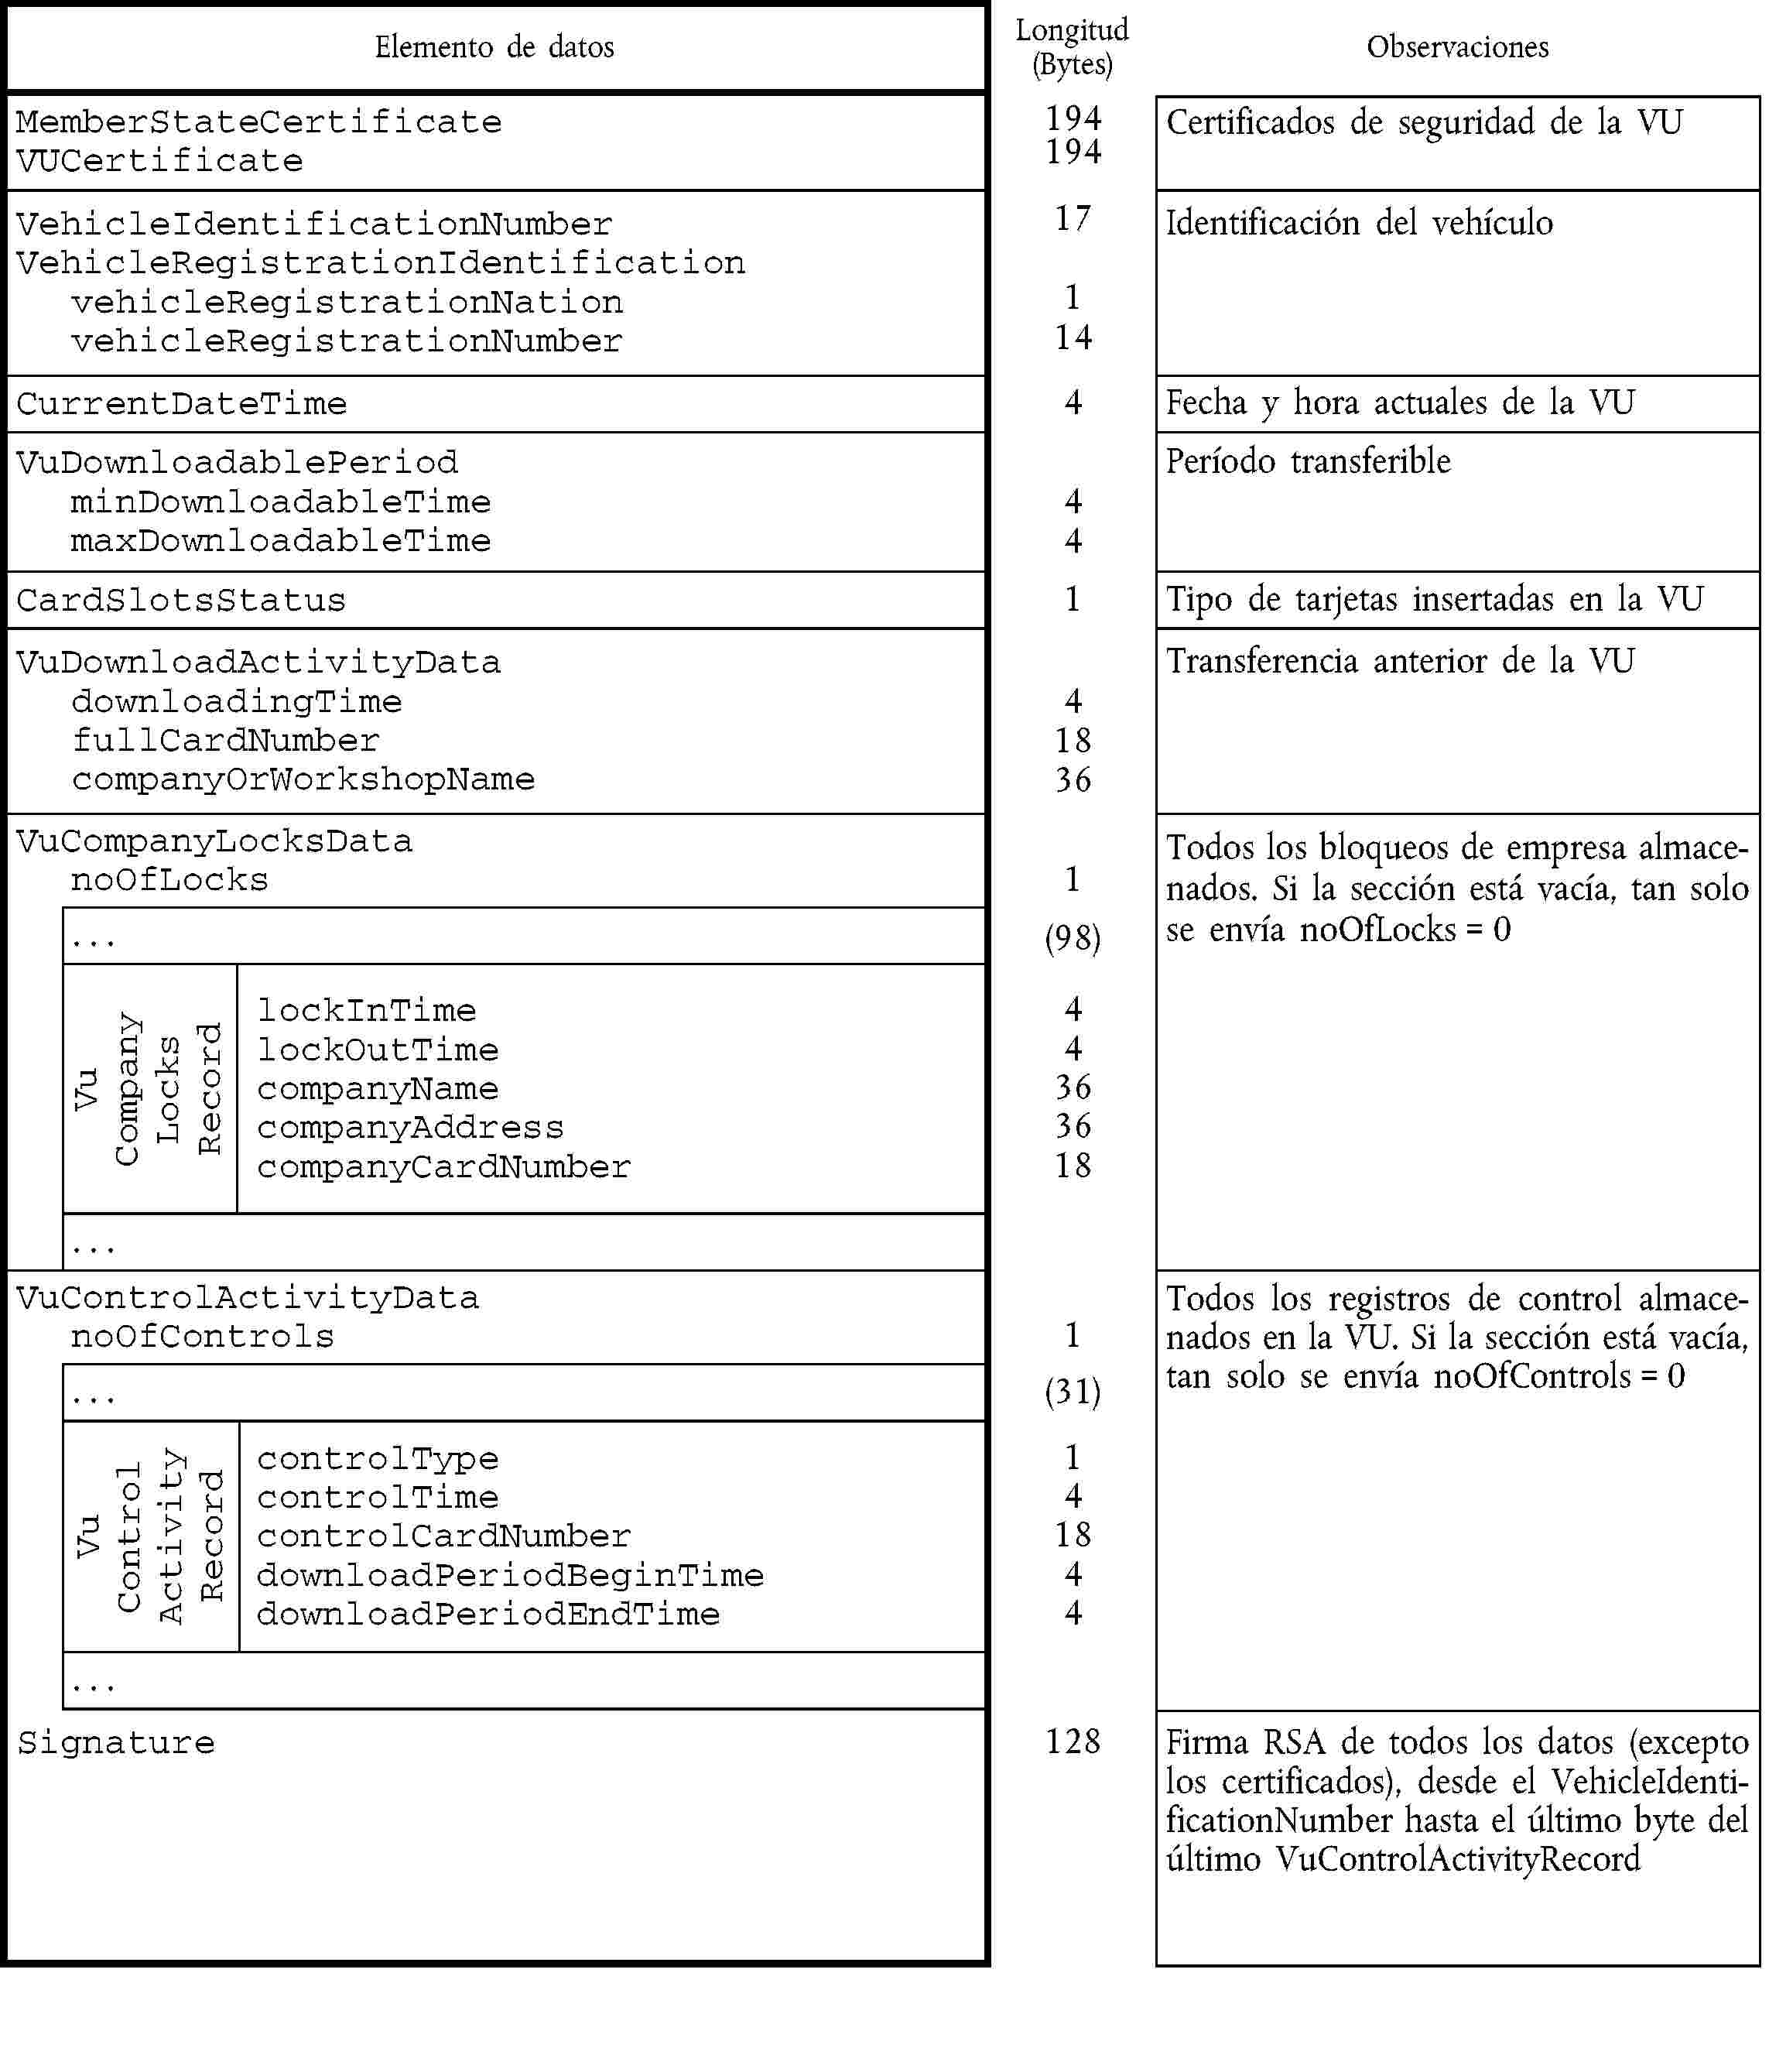 EUR-Lex - 01985R3821-20121001 - EN - EUR-Lex